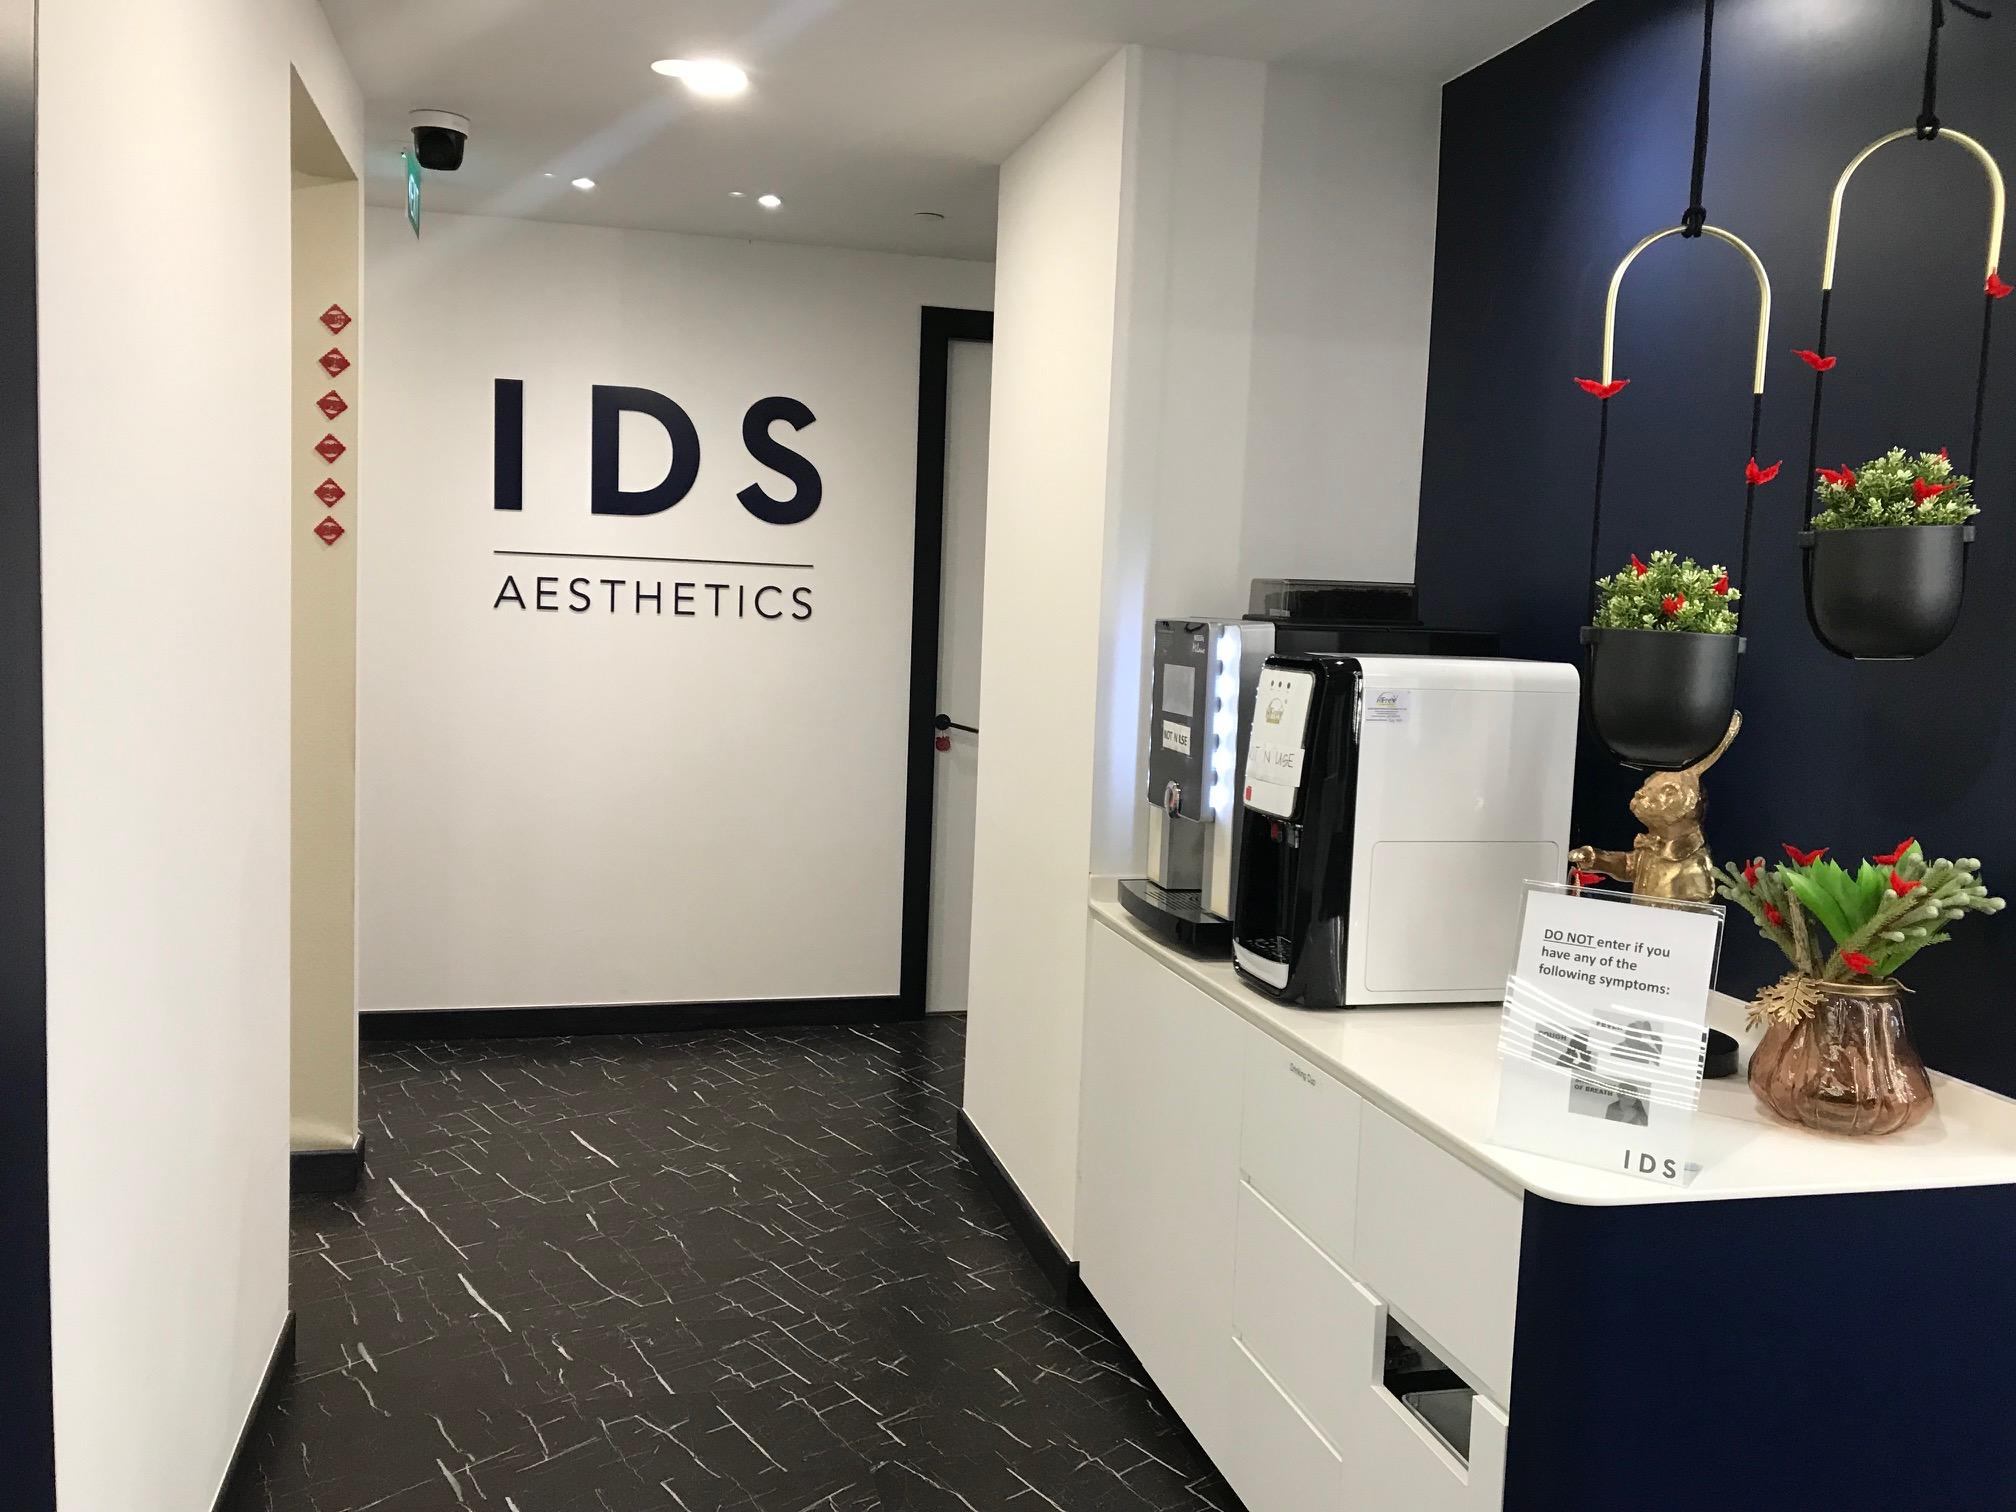 [ Jody Liu ] IDS Journey: The THIRD step to healthier skin is routine Facials